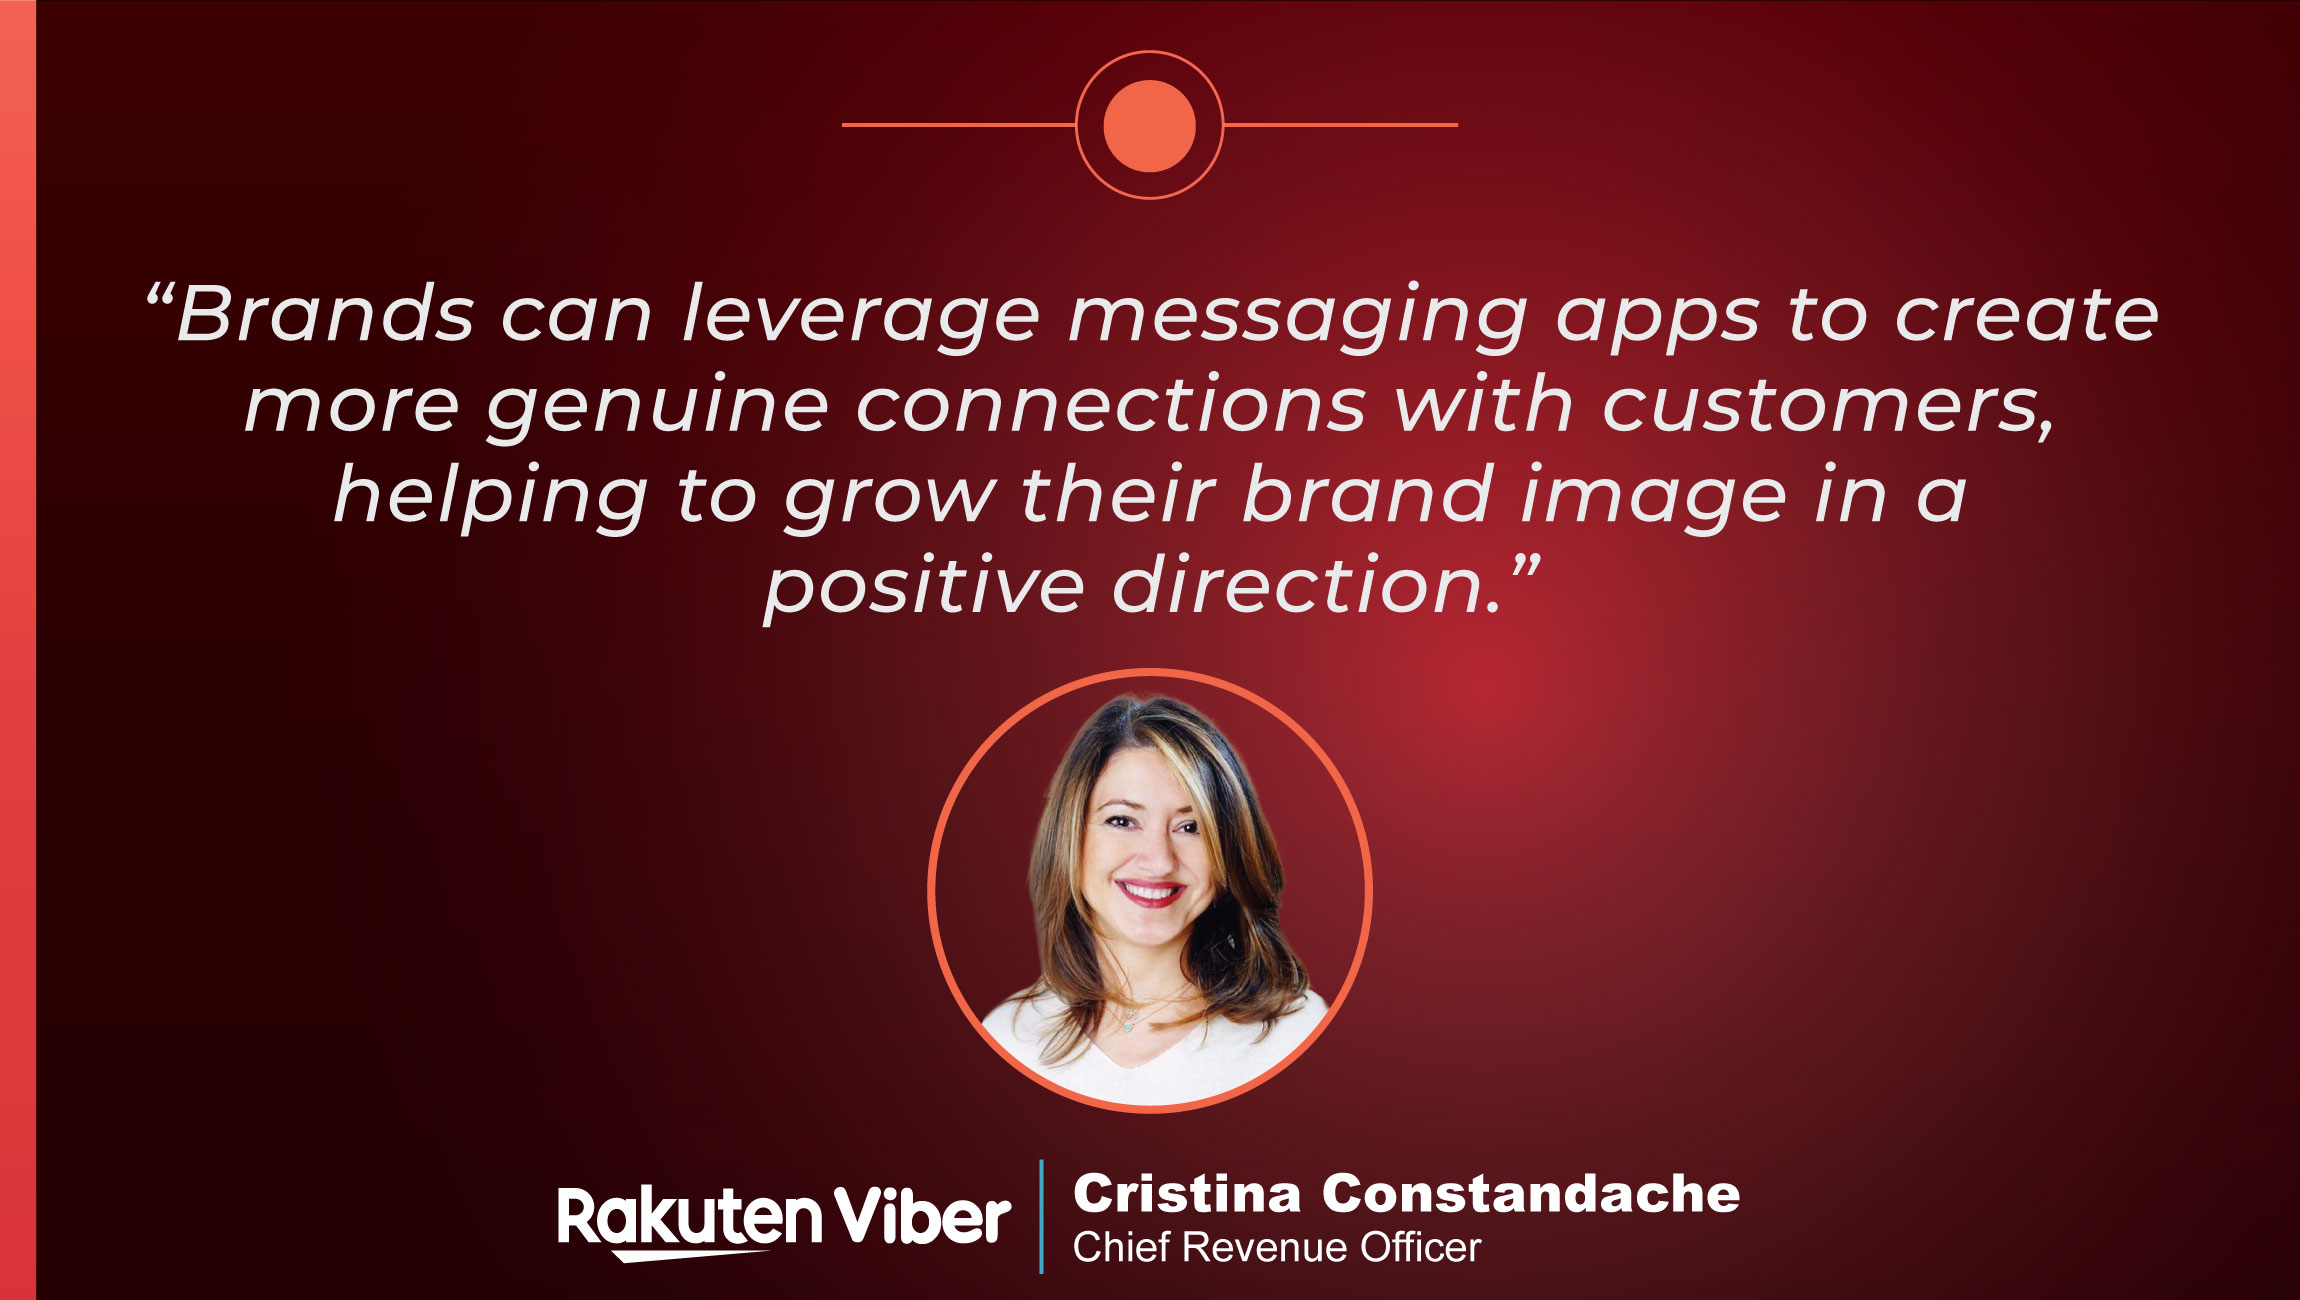 TechBytes with Cristina Constandache, Chief Revenue Officer at Rakuten Viber